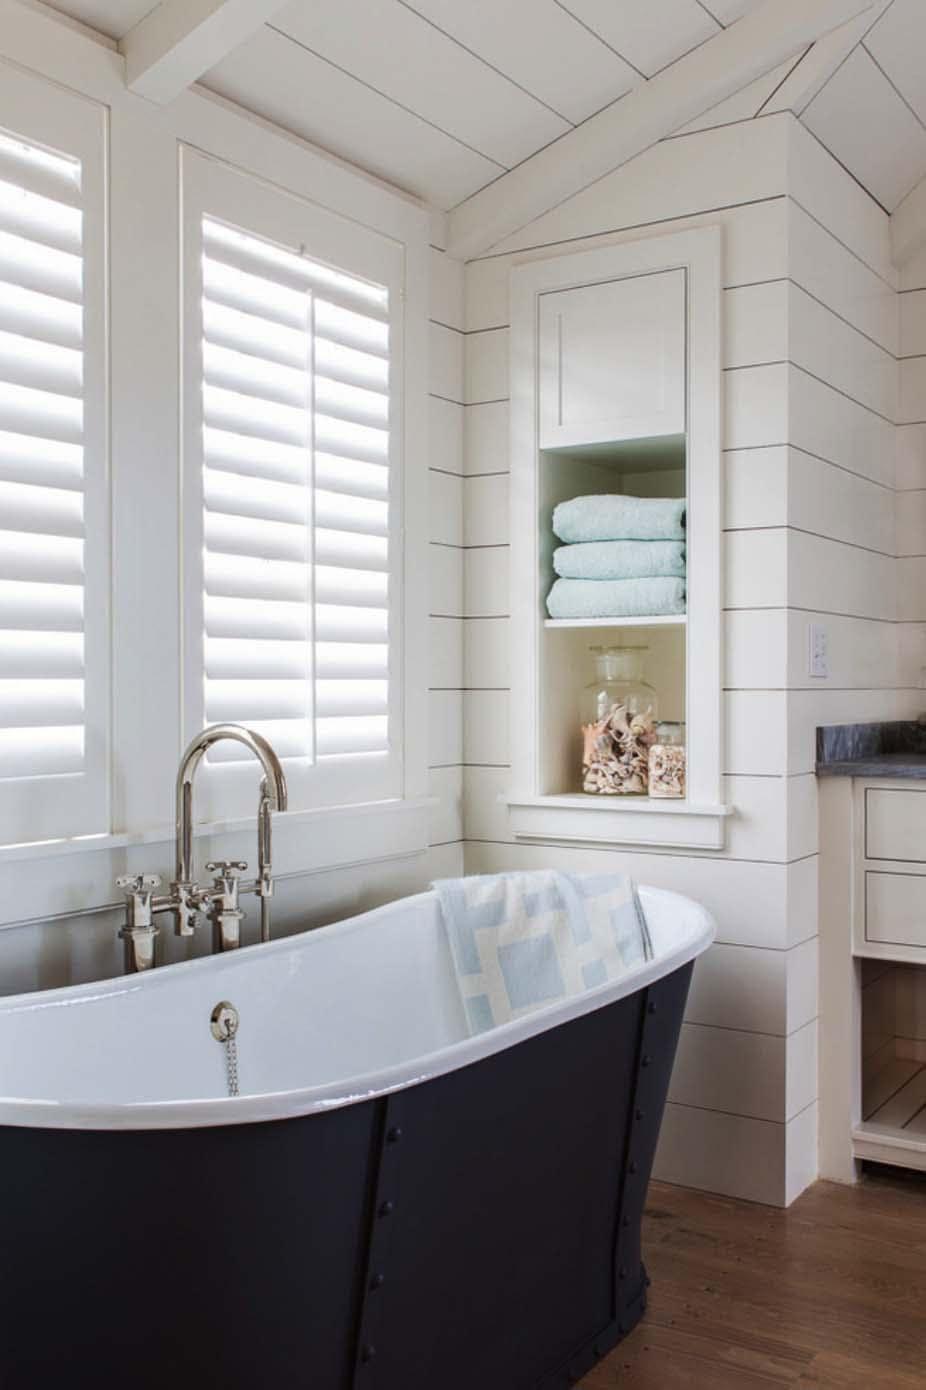 White plantation shutters on bathroom window next to bathtub